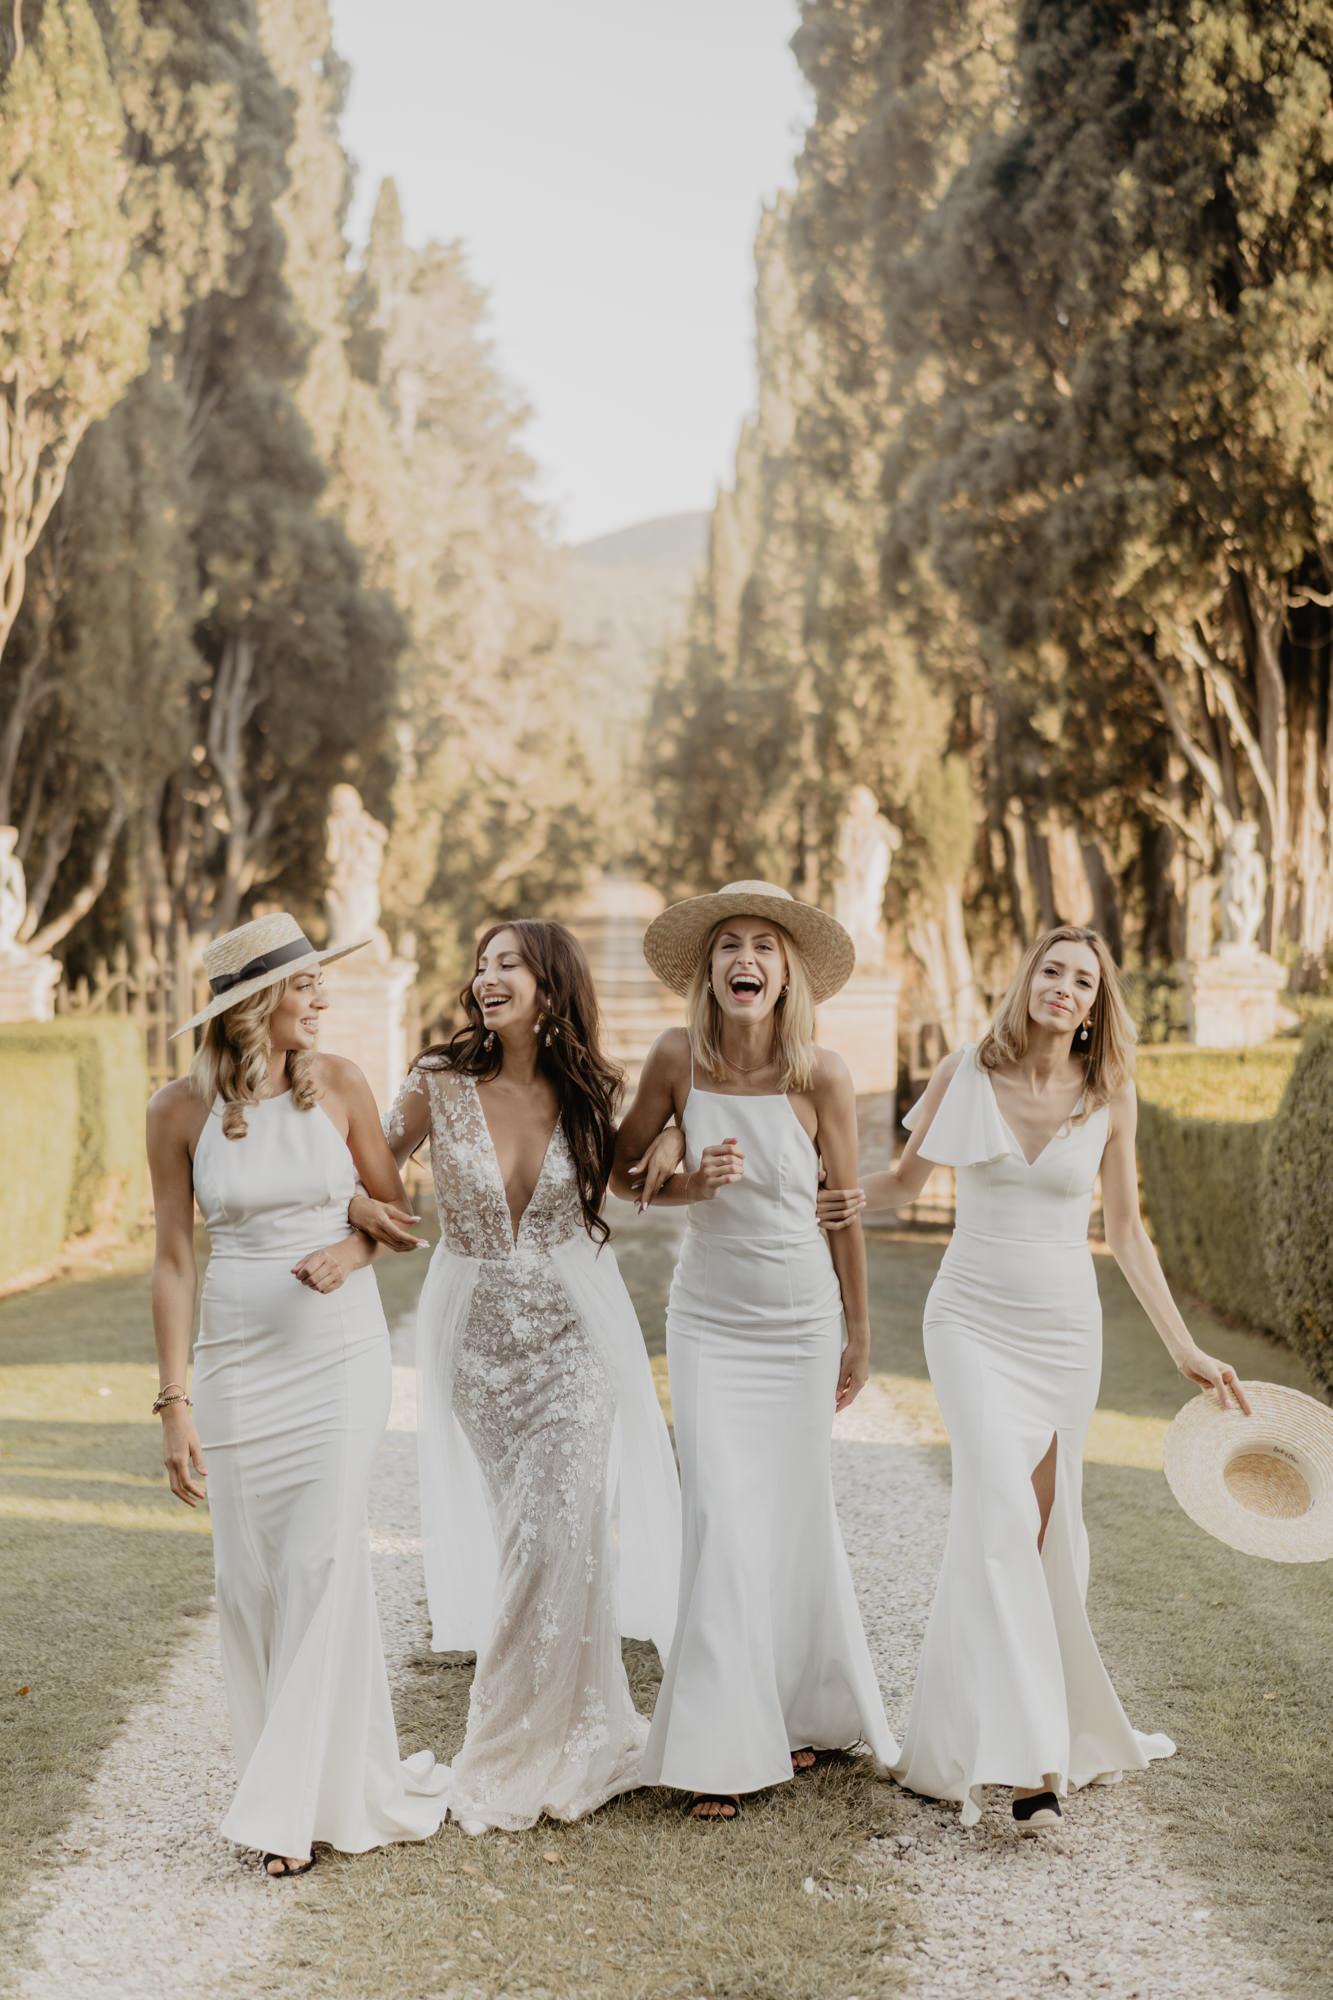 Bridesmaids wearing ivory spaghetti strap gowns - David Bastianoni - Italy